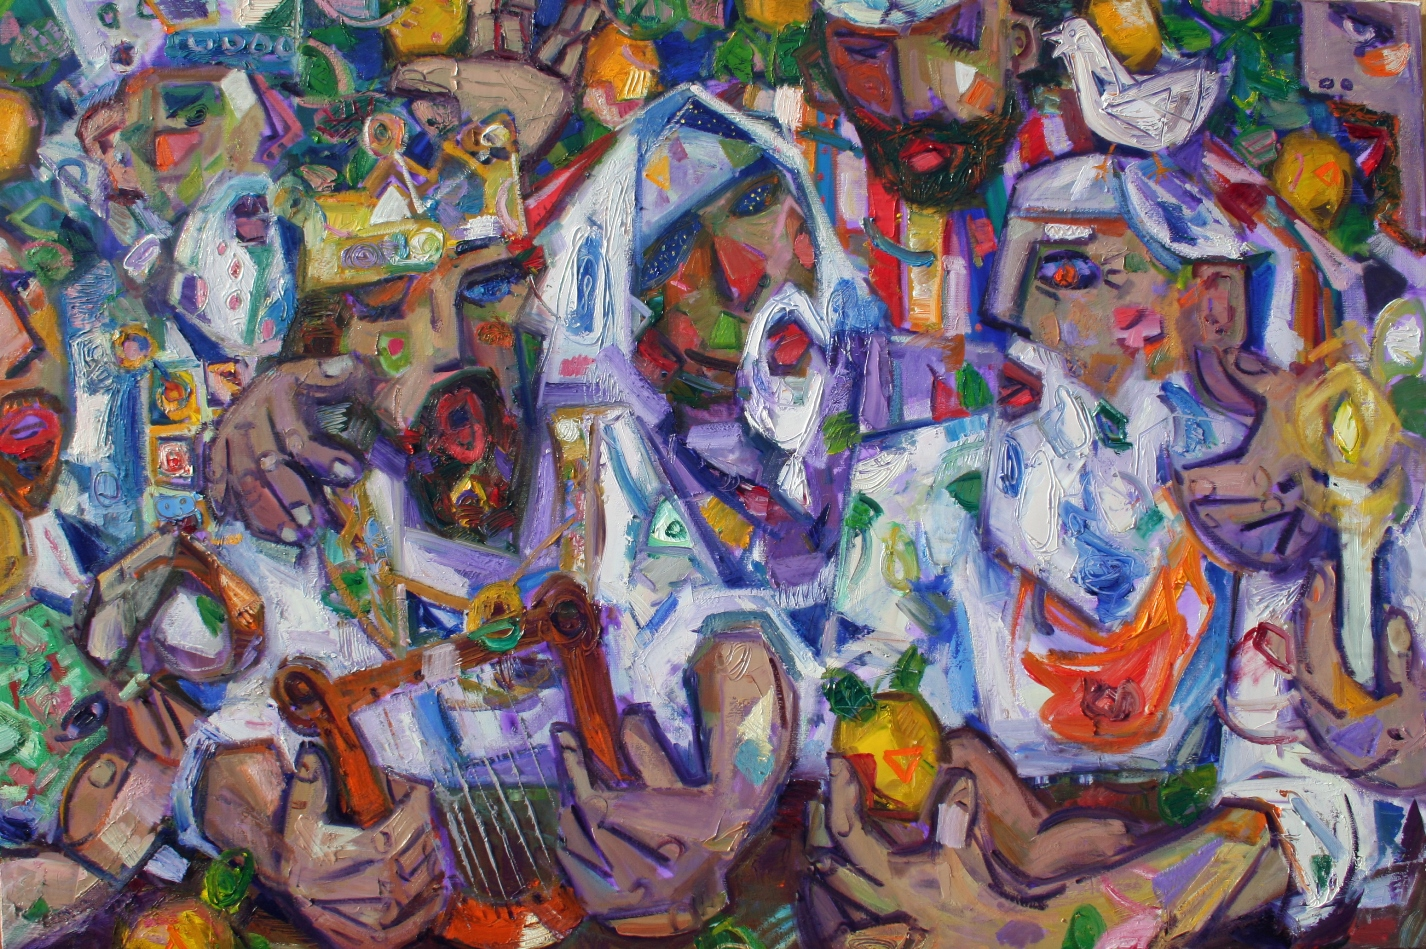 """""Ushpizin II"", 40x60 inches, oil on canvas"